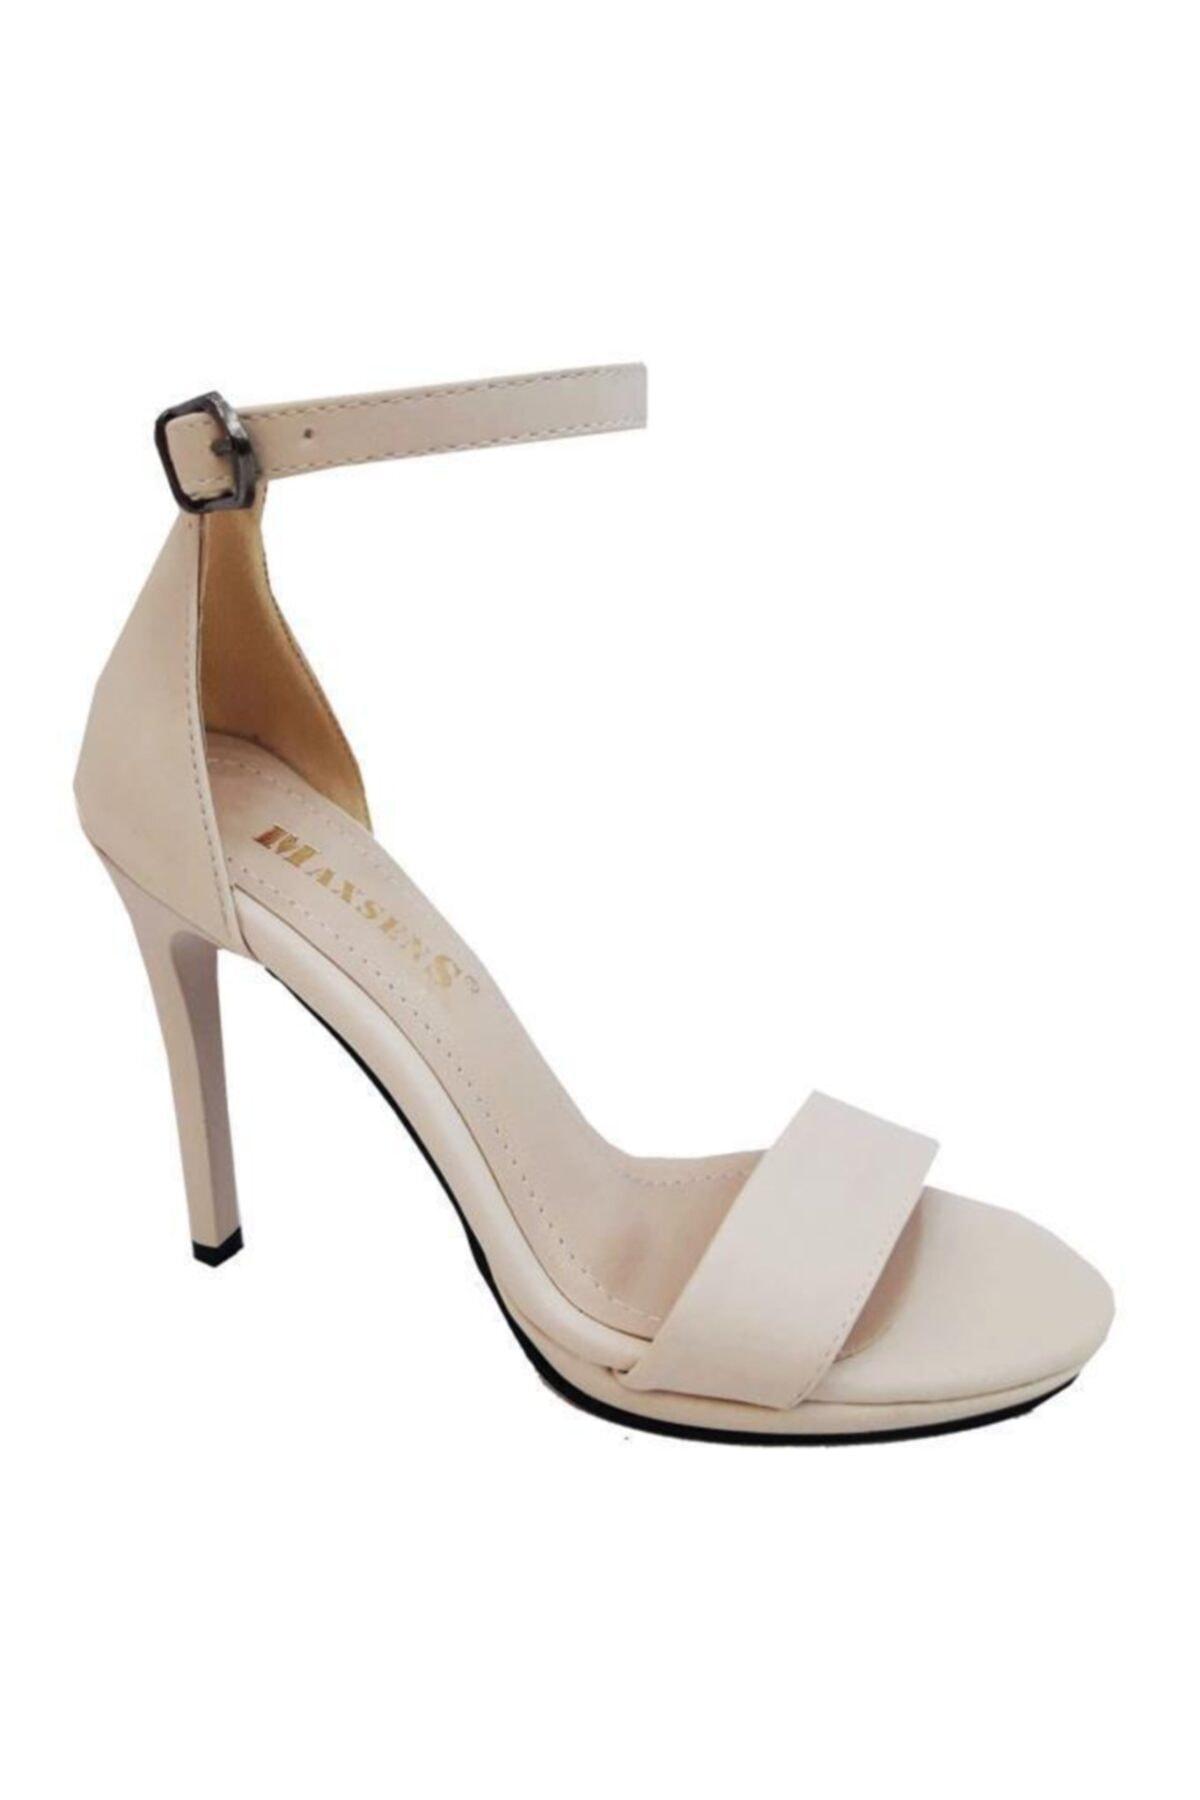 GİZEM Kadın Siyah Deri Sivri Topuklu Sandalet Maxsens 802